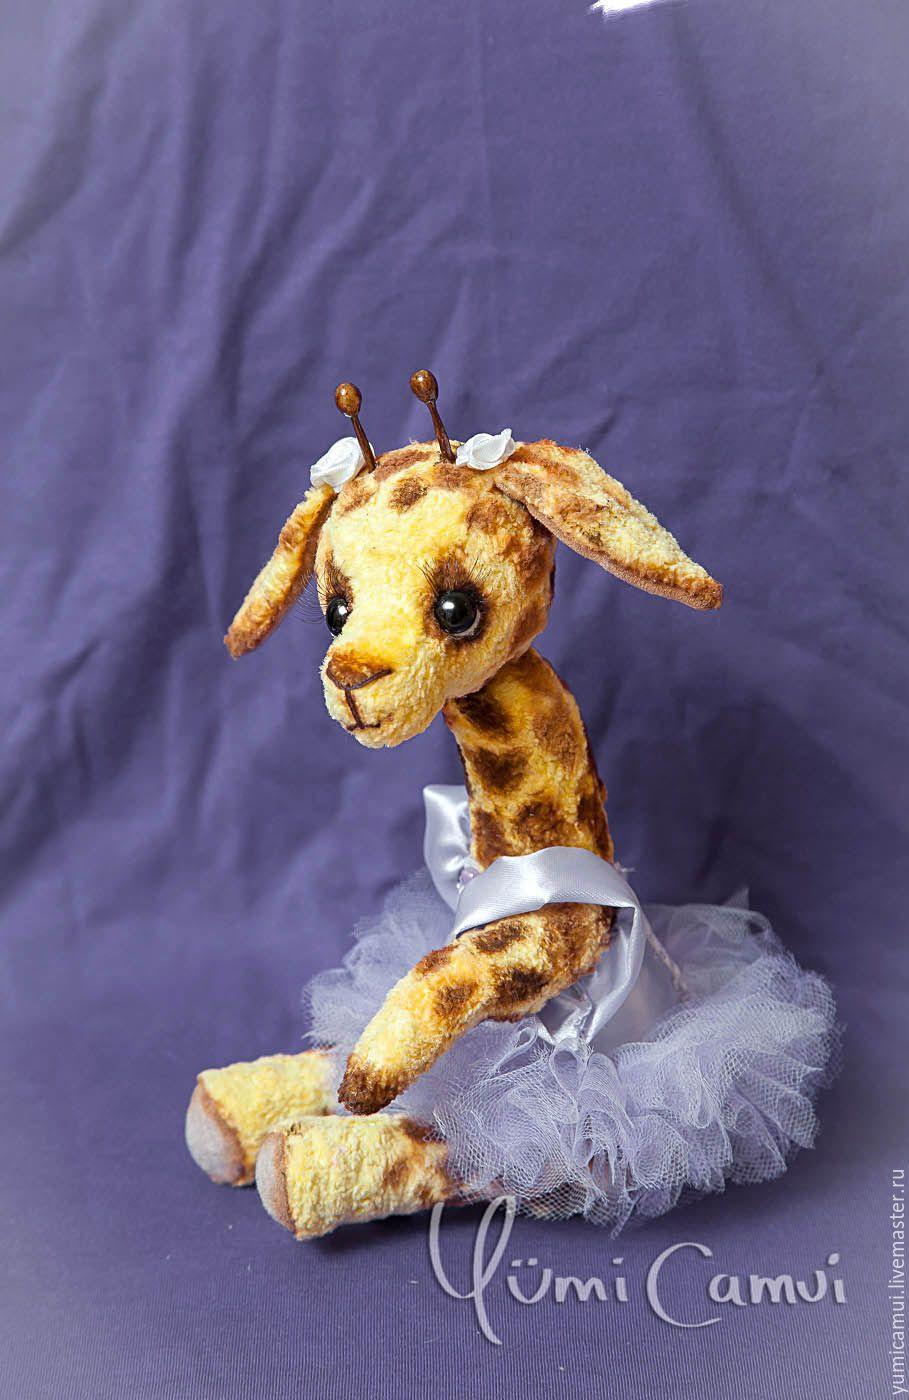 Купить Тедди Жираф Мая. - коричневый, тедди, тедди мишка, мишка тедди, мишка, жираф